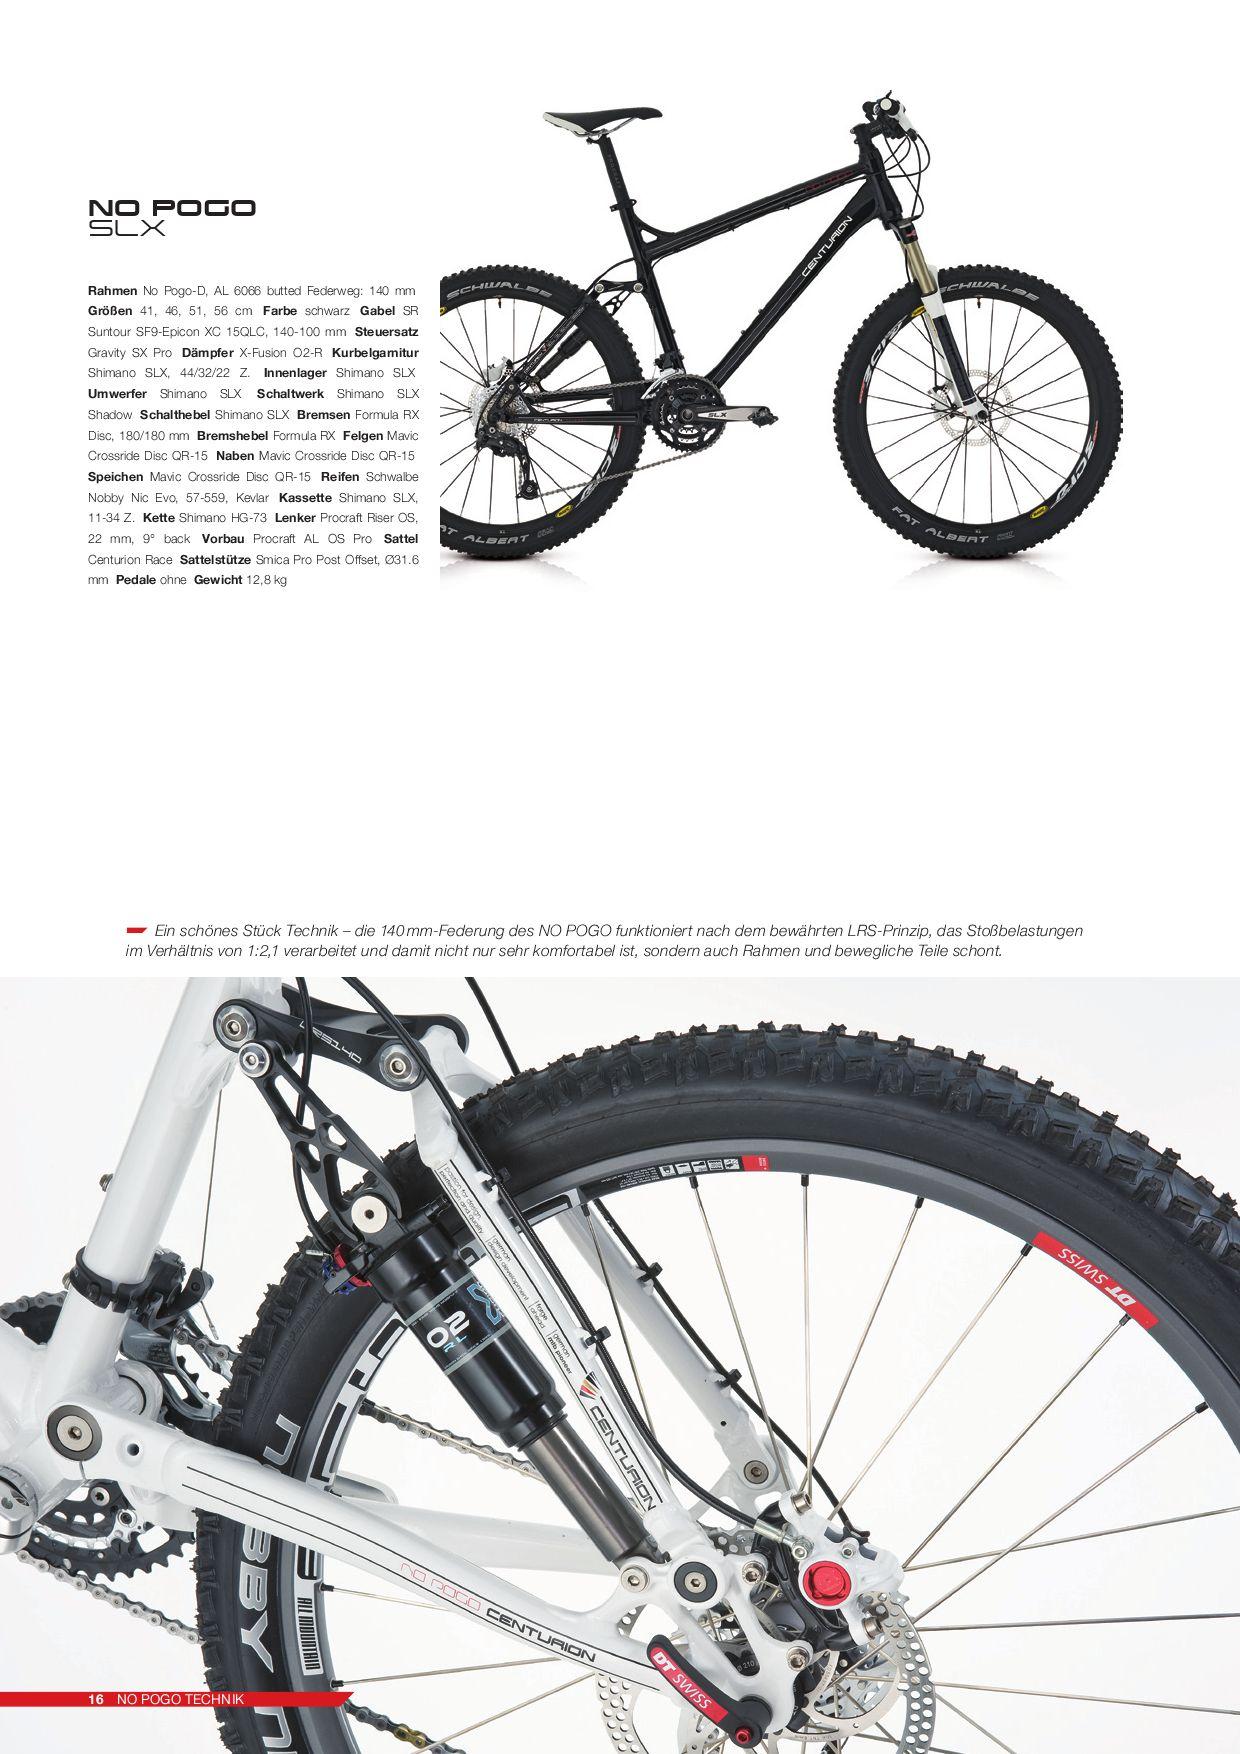 Centurion Bikes Katalog 2010 by MERIDA & CENTURION Germany GmbH - issuu